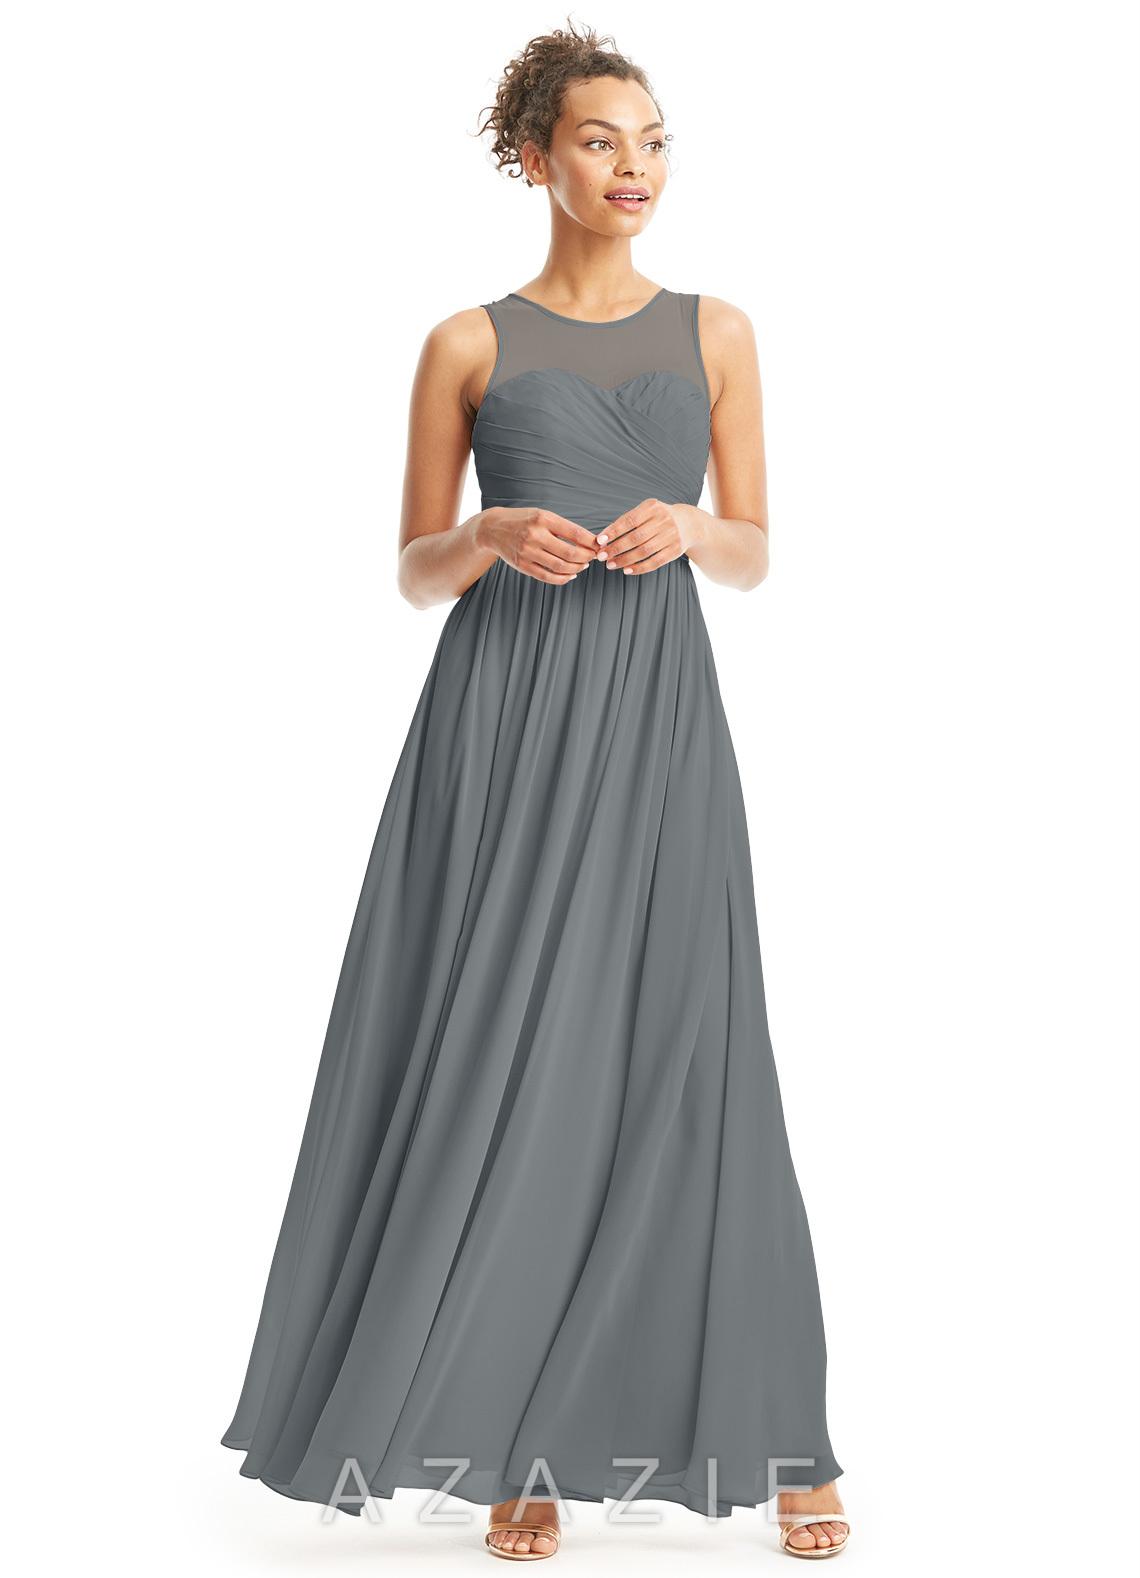 Azazie Alexis Bridesmaid Dress - Cabernet | Azazie